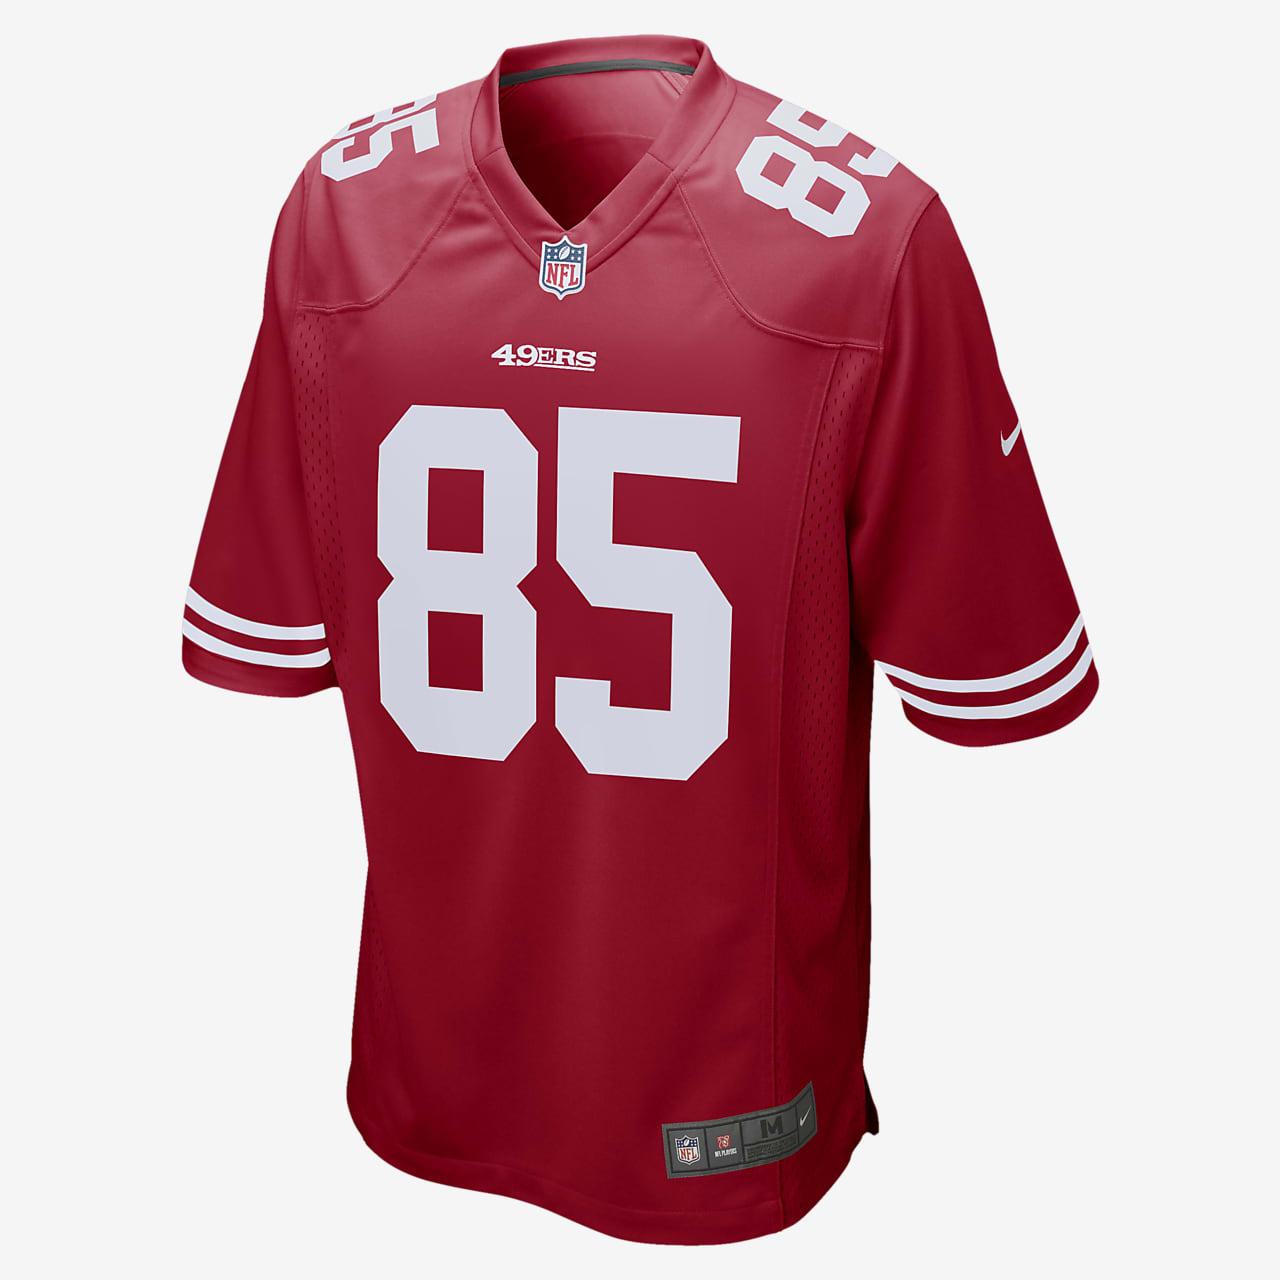 NFL San Francisco 49ers (George Kittle) Men's Game Football Jersey